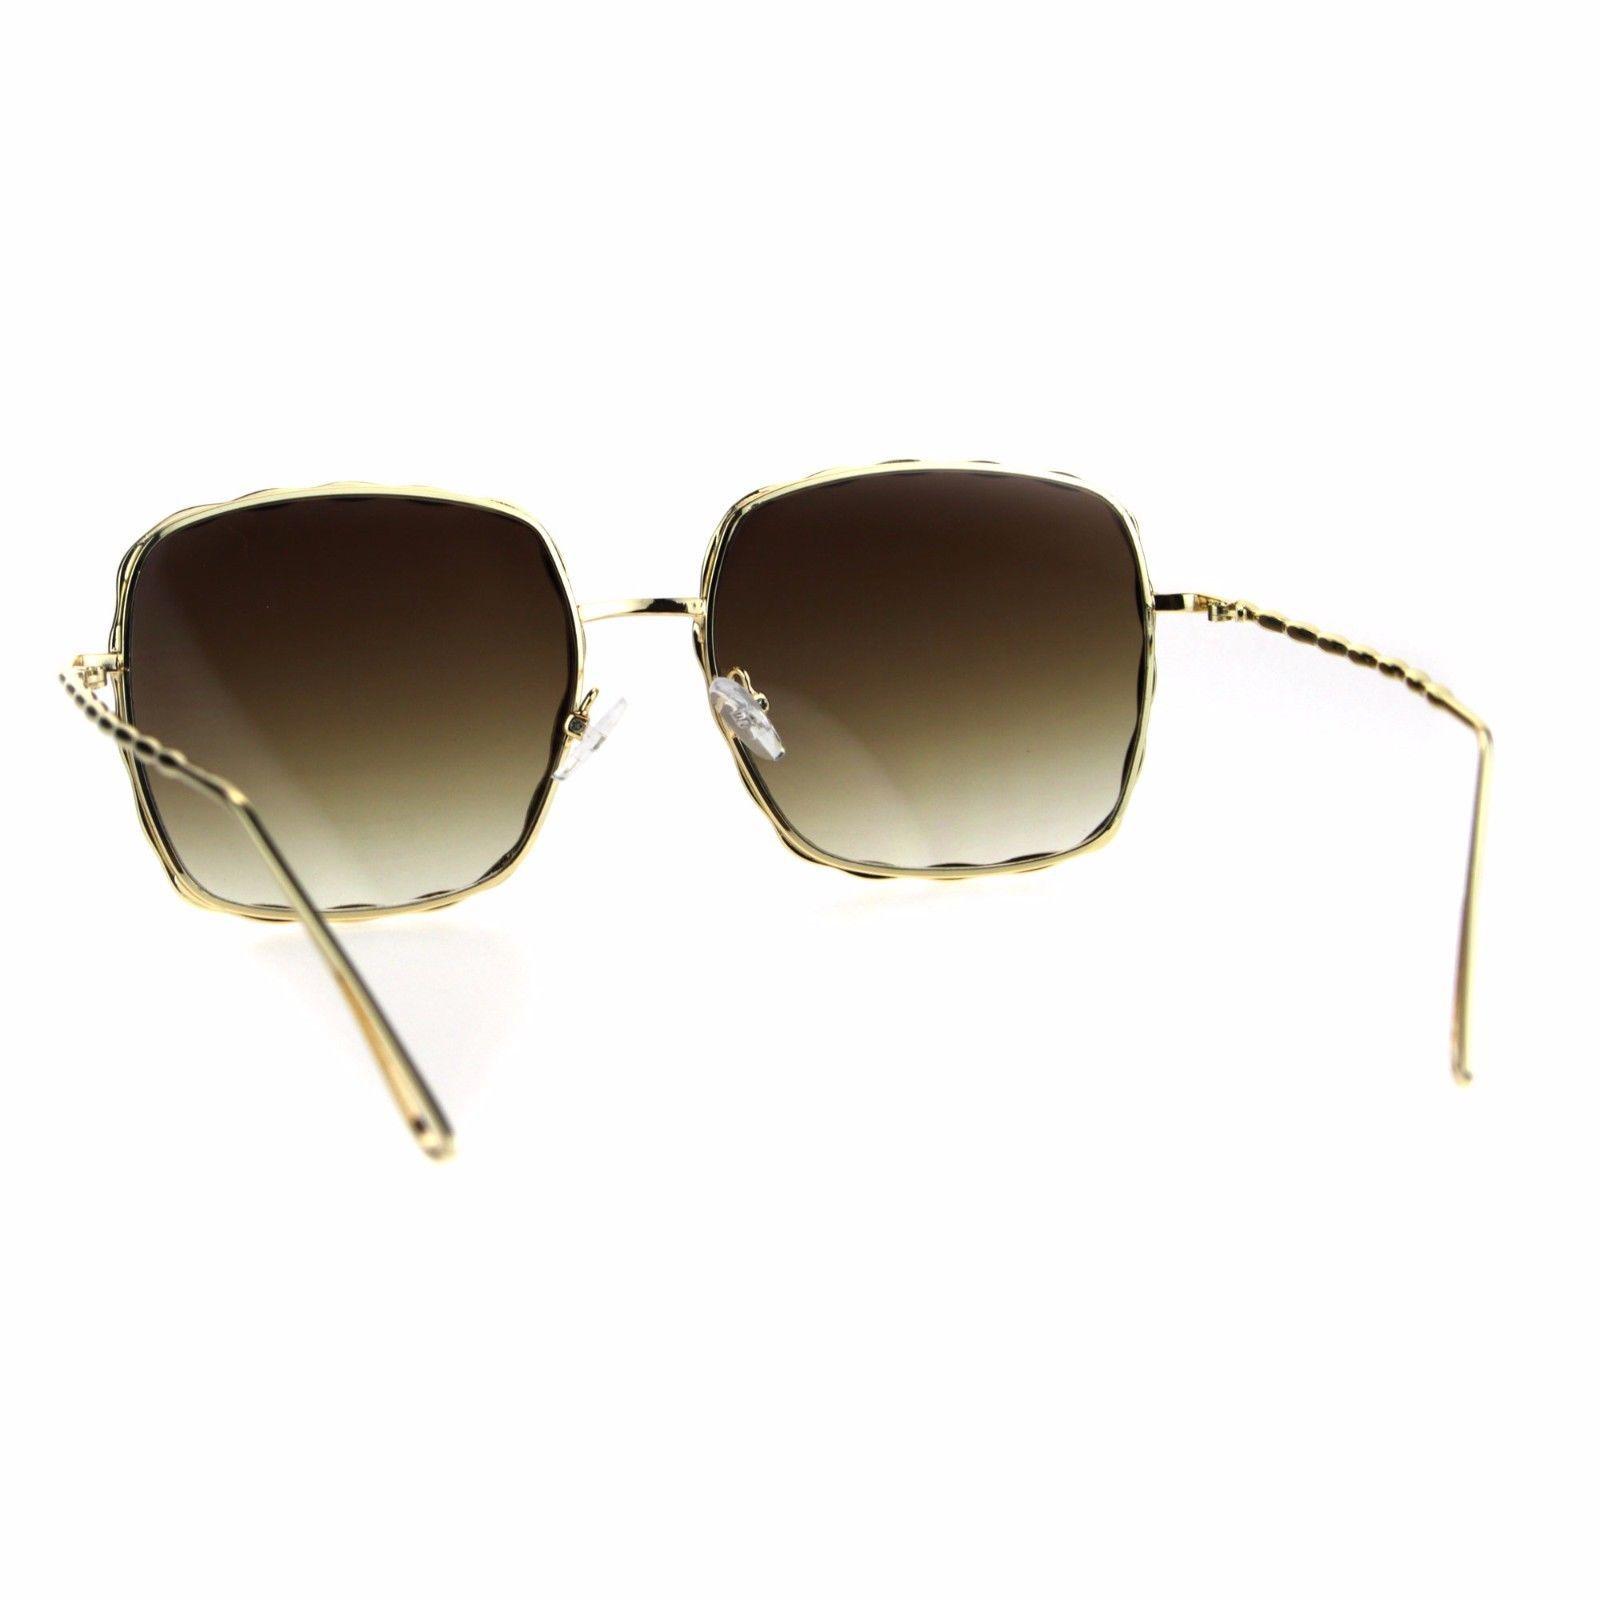 94348f16d2 Womens Rectangular Bling Jewel Metal Rim Designer Butterfly Sunglasses